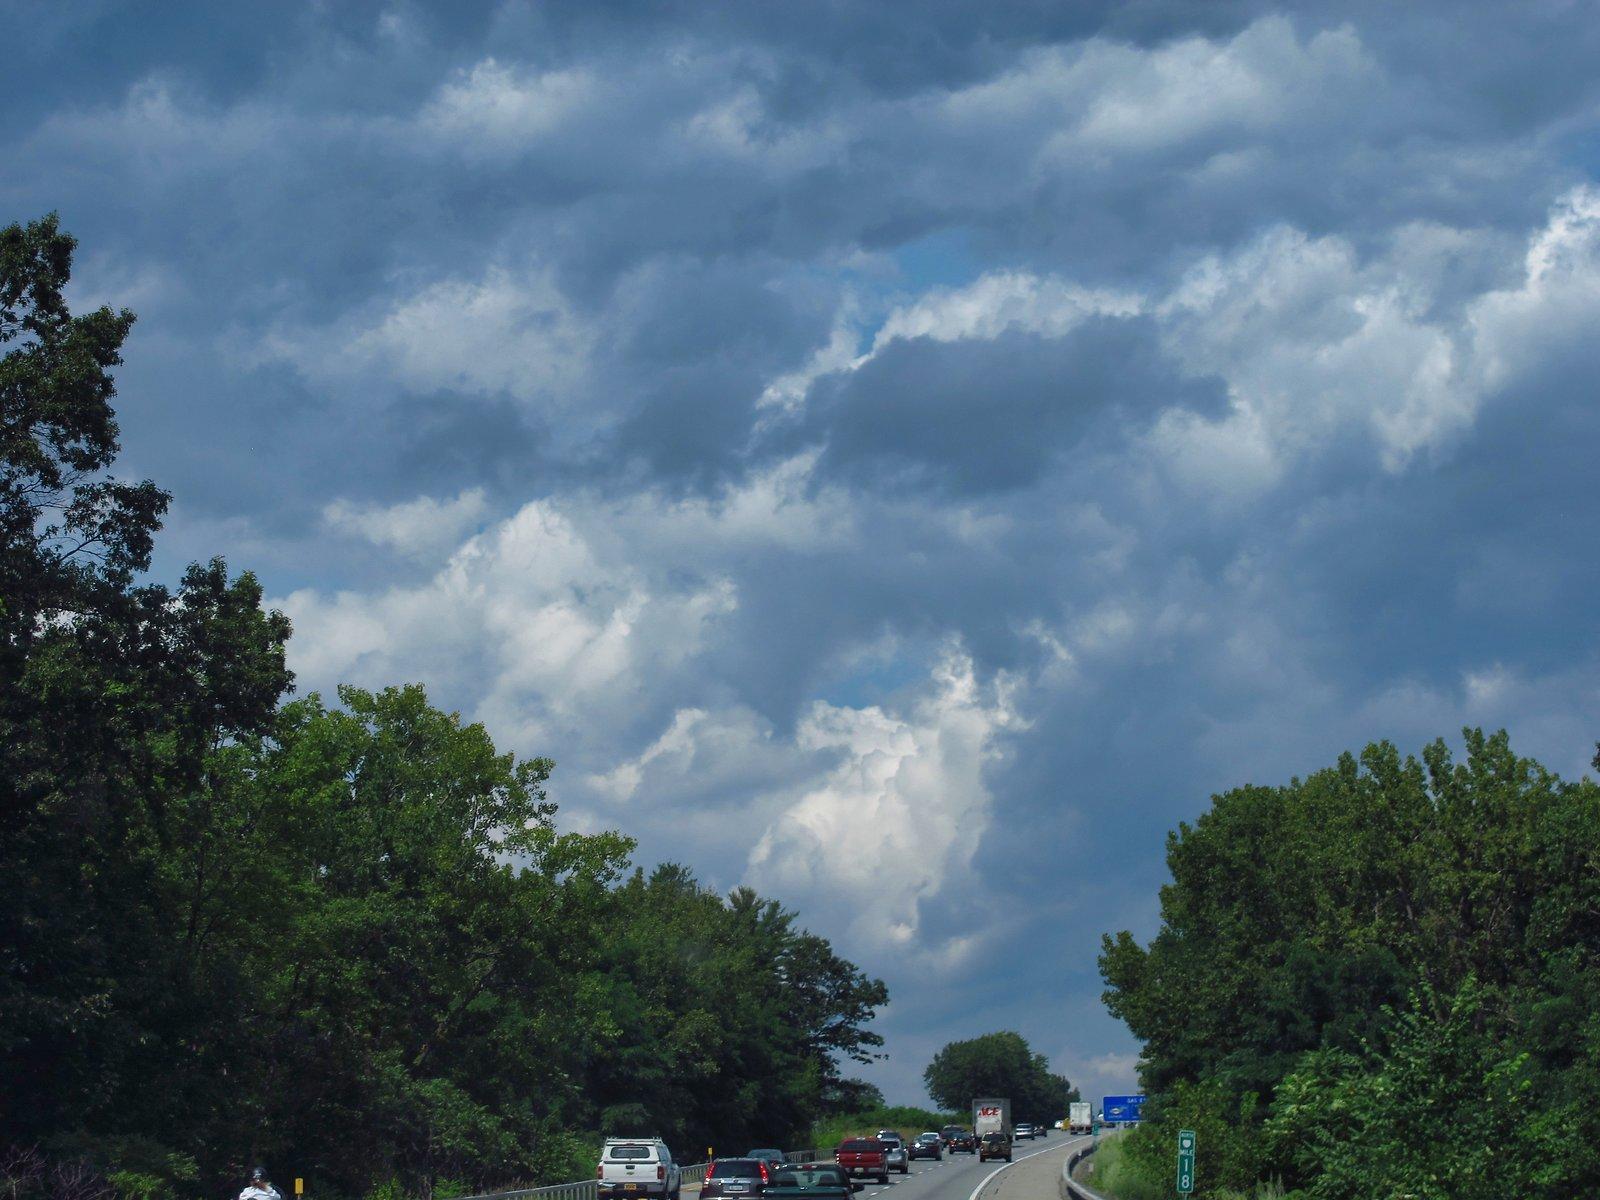 G12 clouds 006 B.jpg